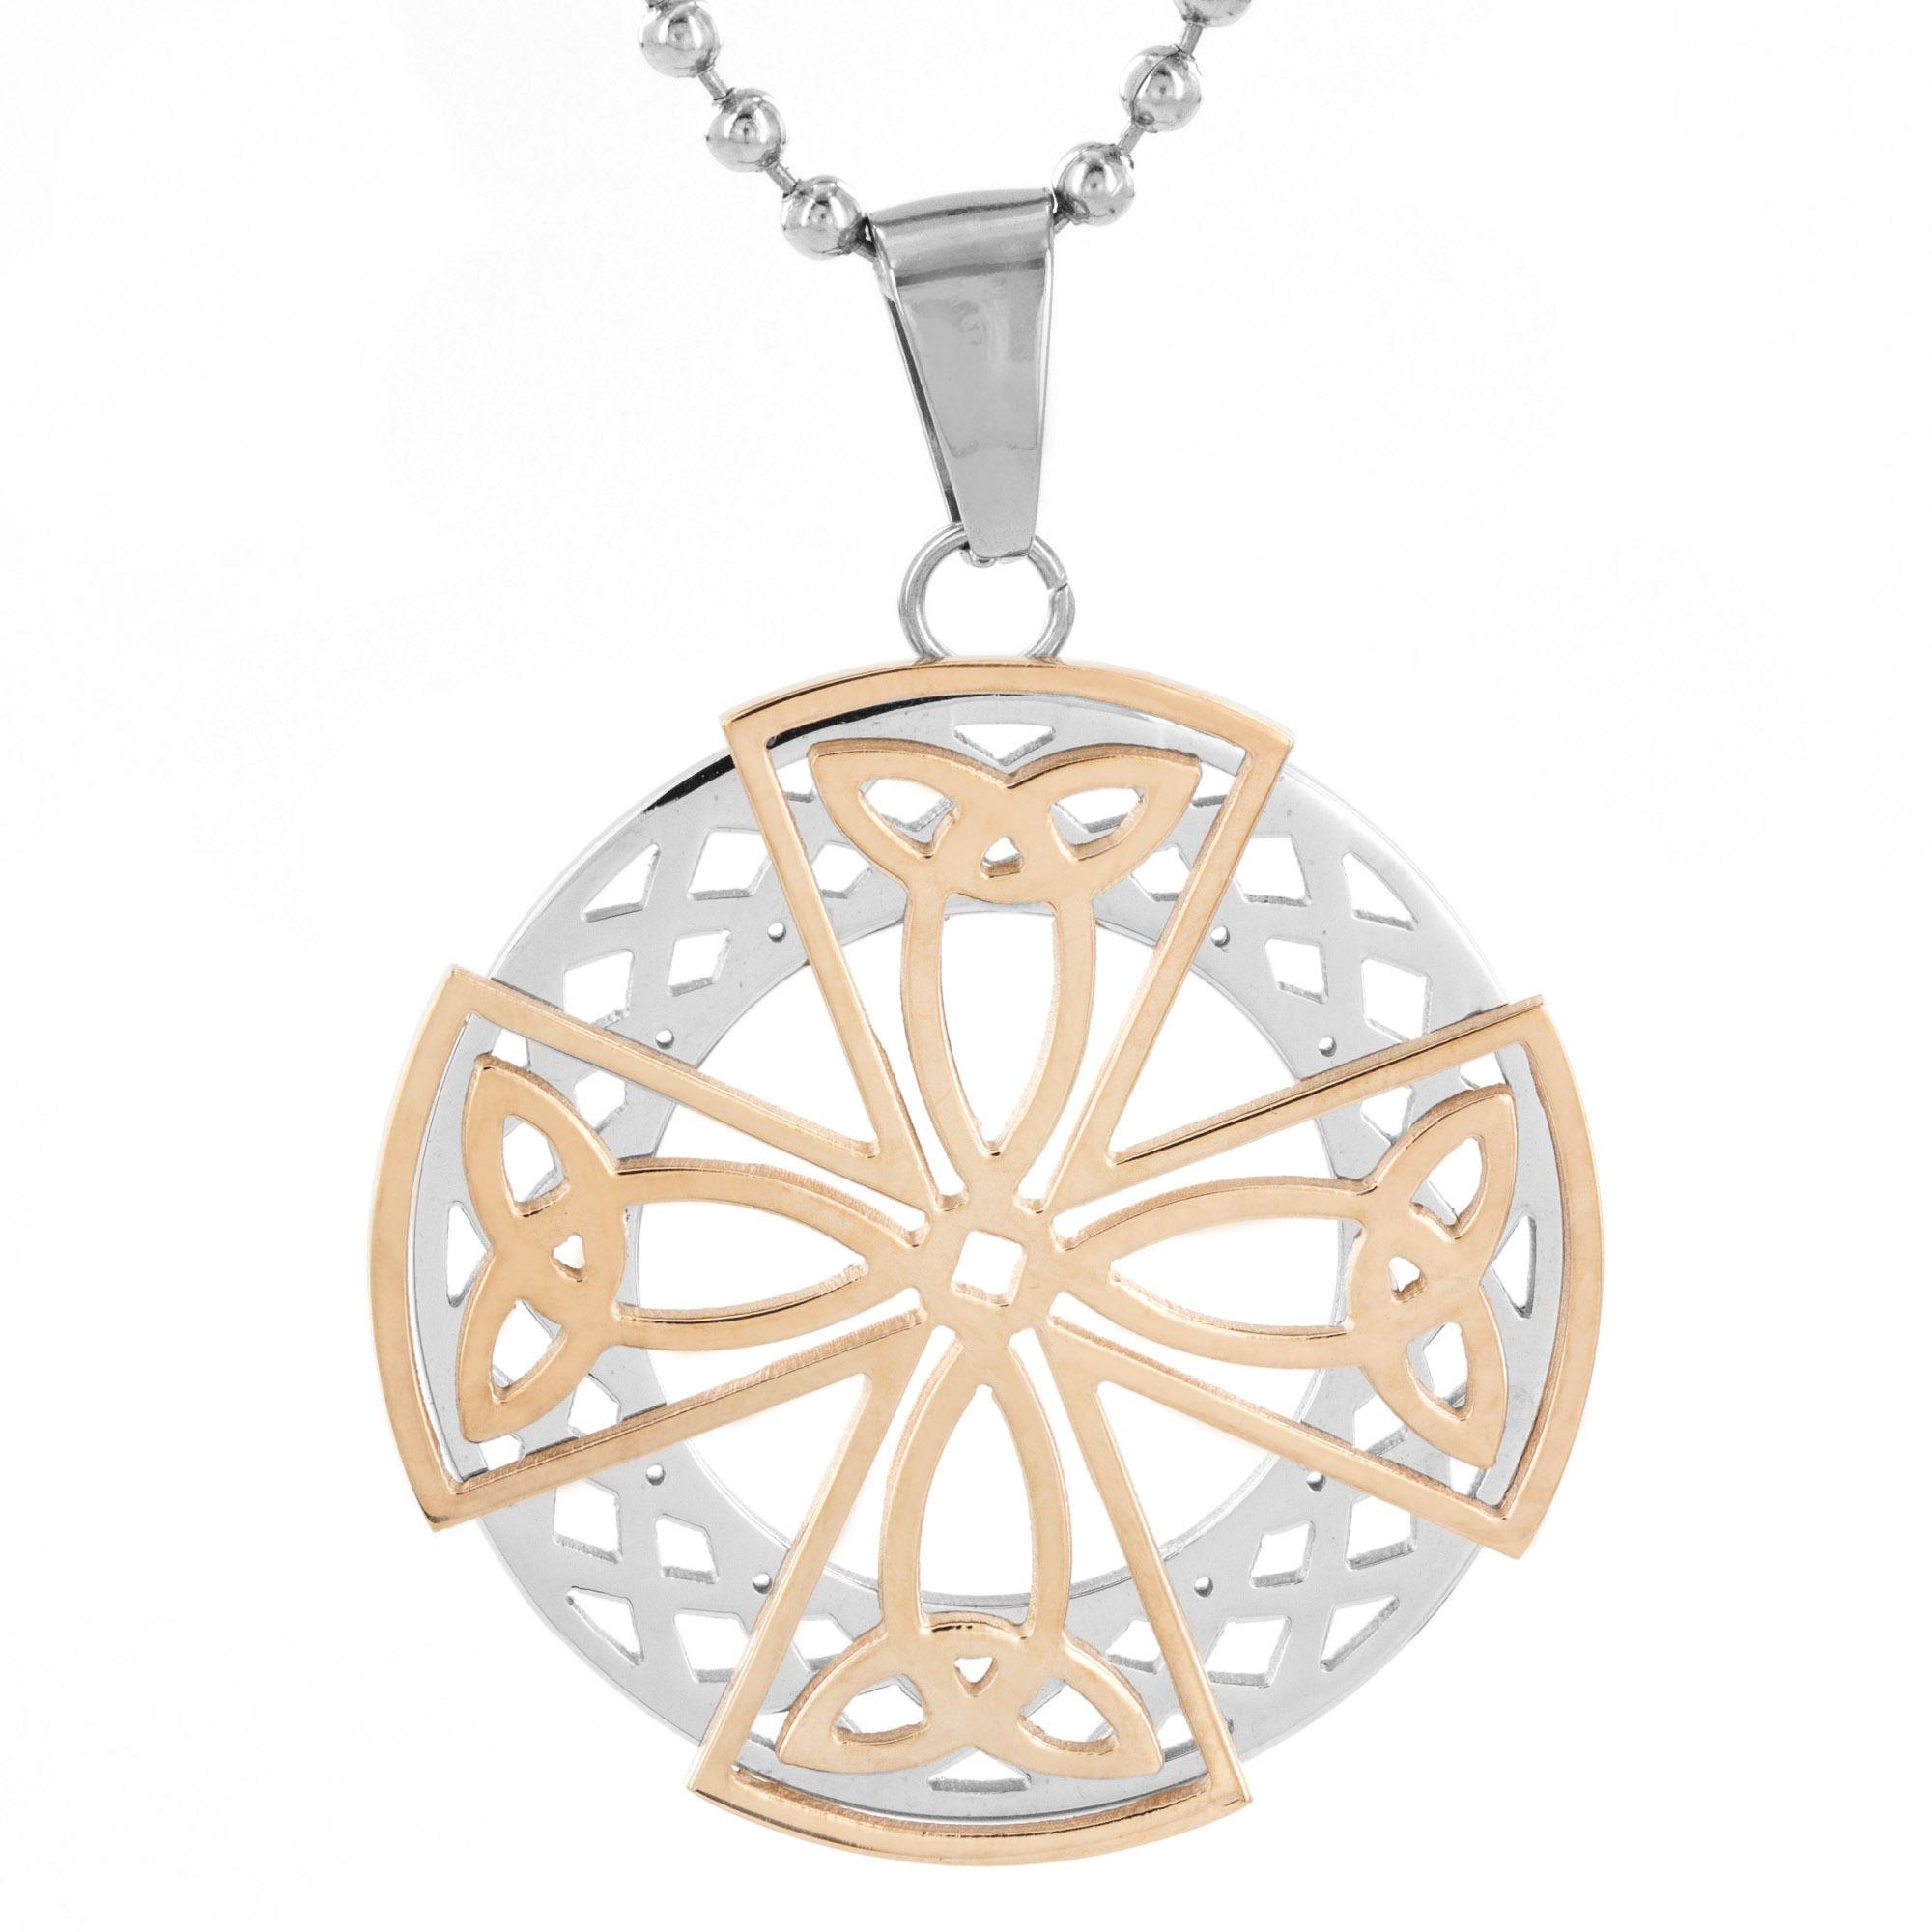 West Coast Jewelry Men's Stainless Steel Celtic Cross Medallion Pendant Necklace